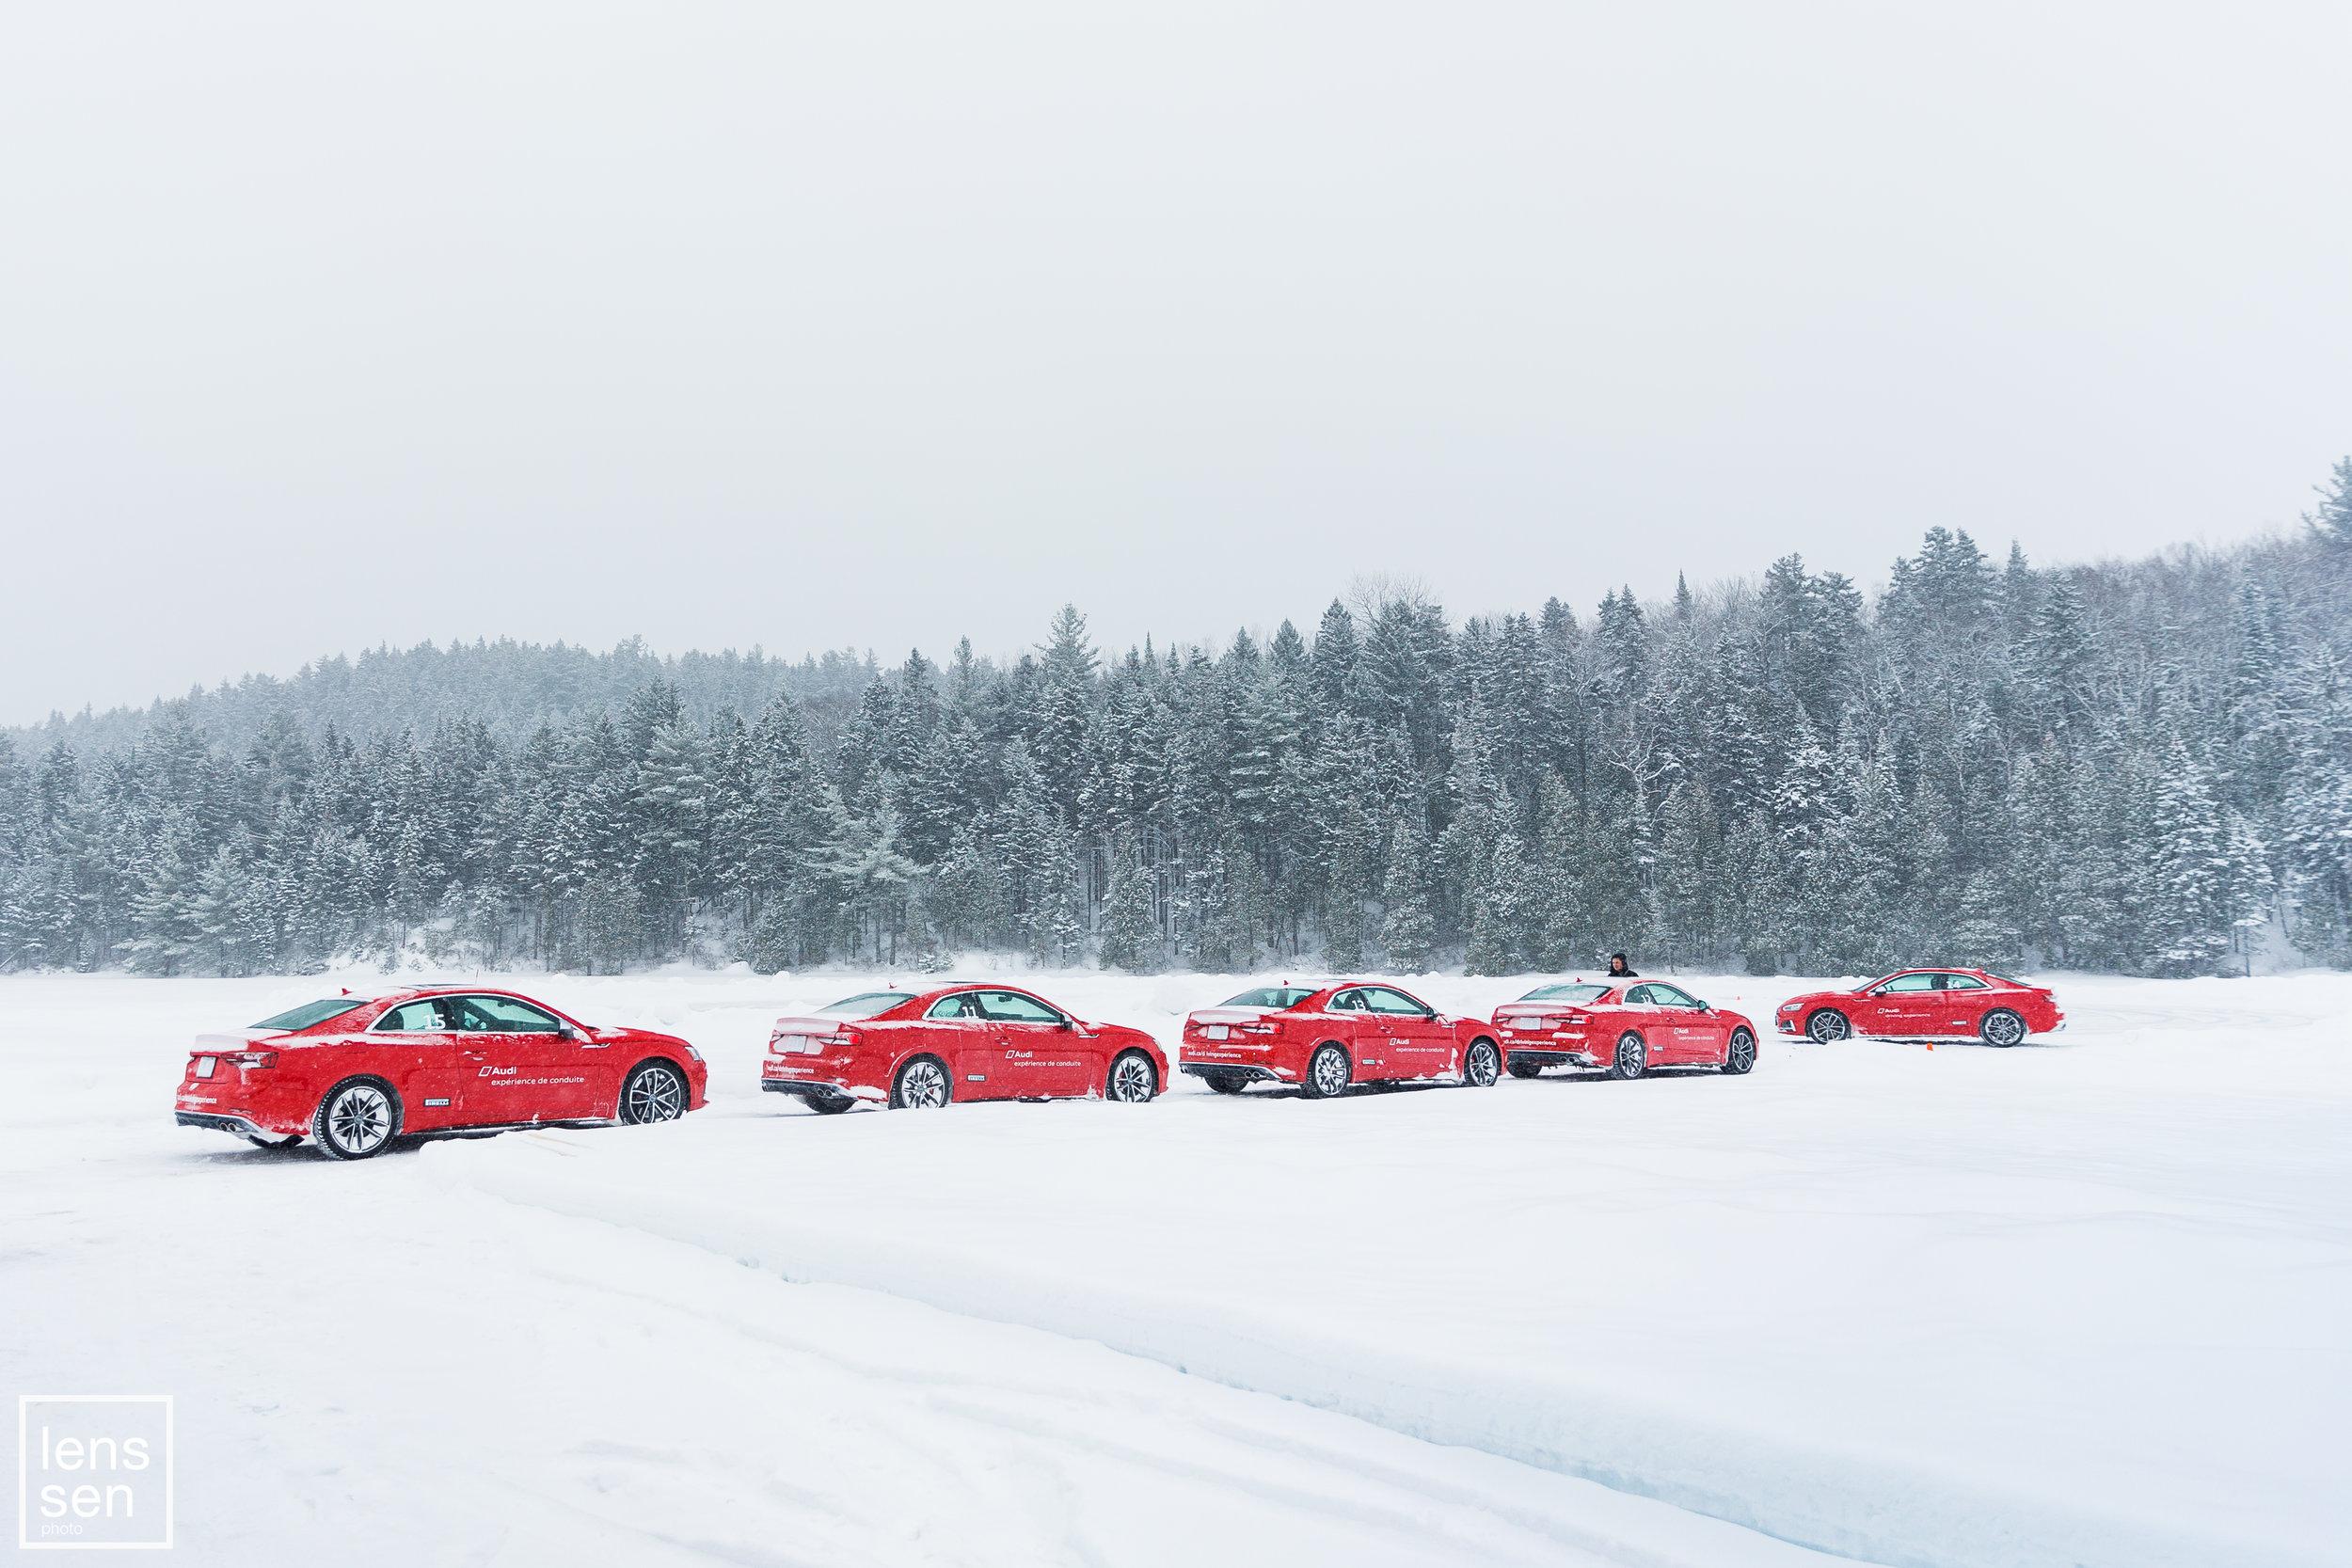 Audi Ice Experience - Sacacomie QC - Feb 2018 - 115 -5028.jpg